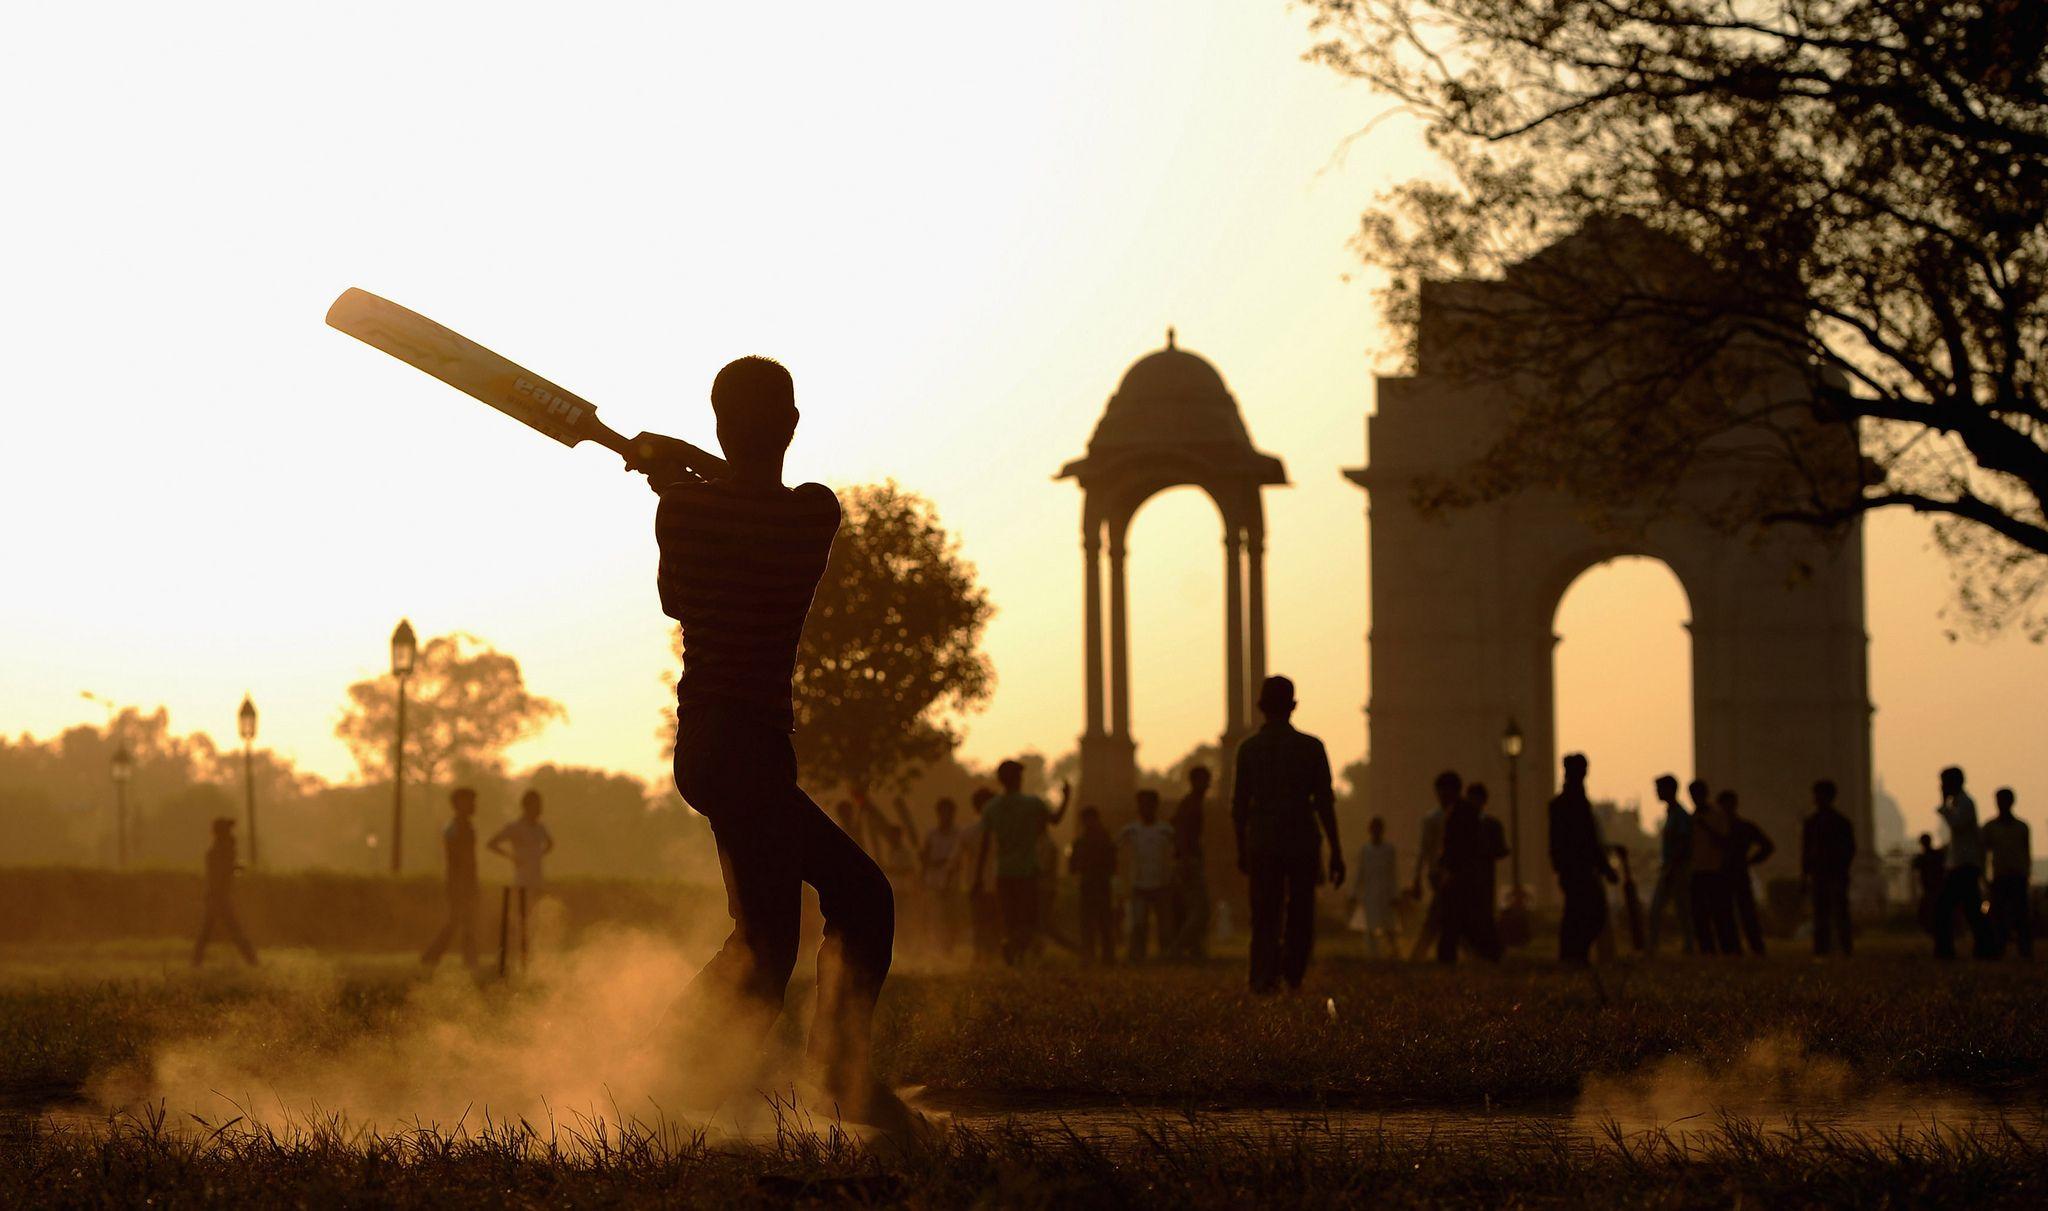 Street Cricket Cricket in india, India gate, Street